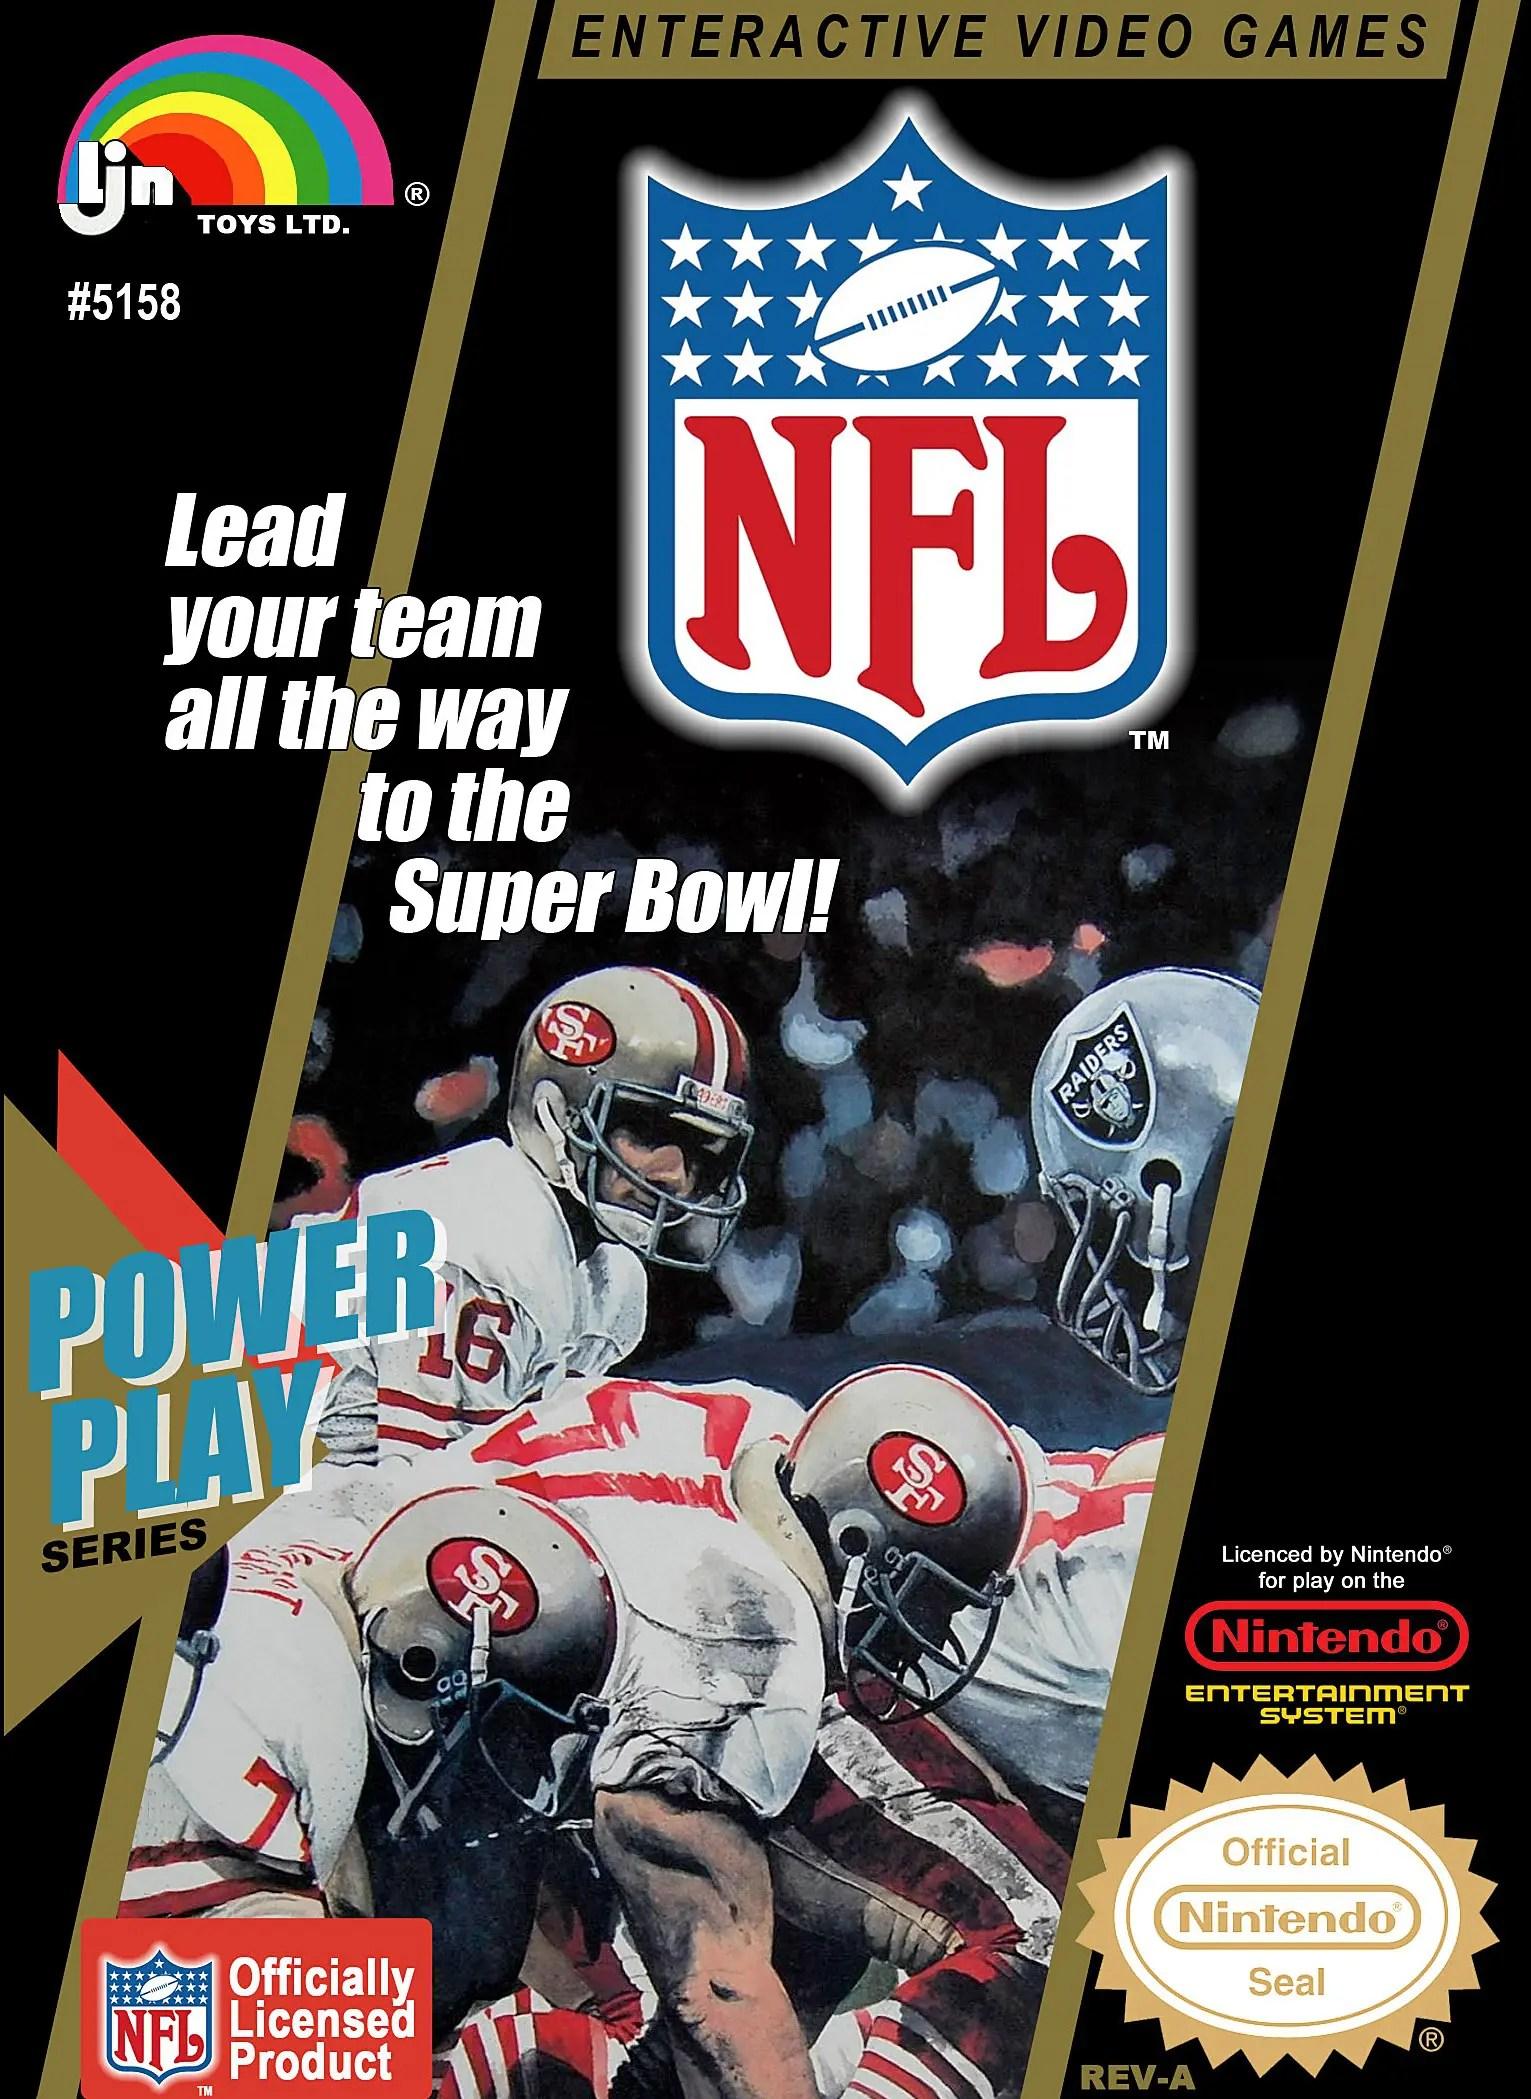 NFL Football for Nintendo Entertainment System (NES)